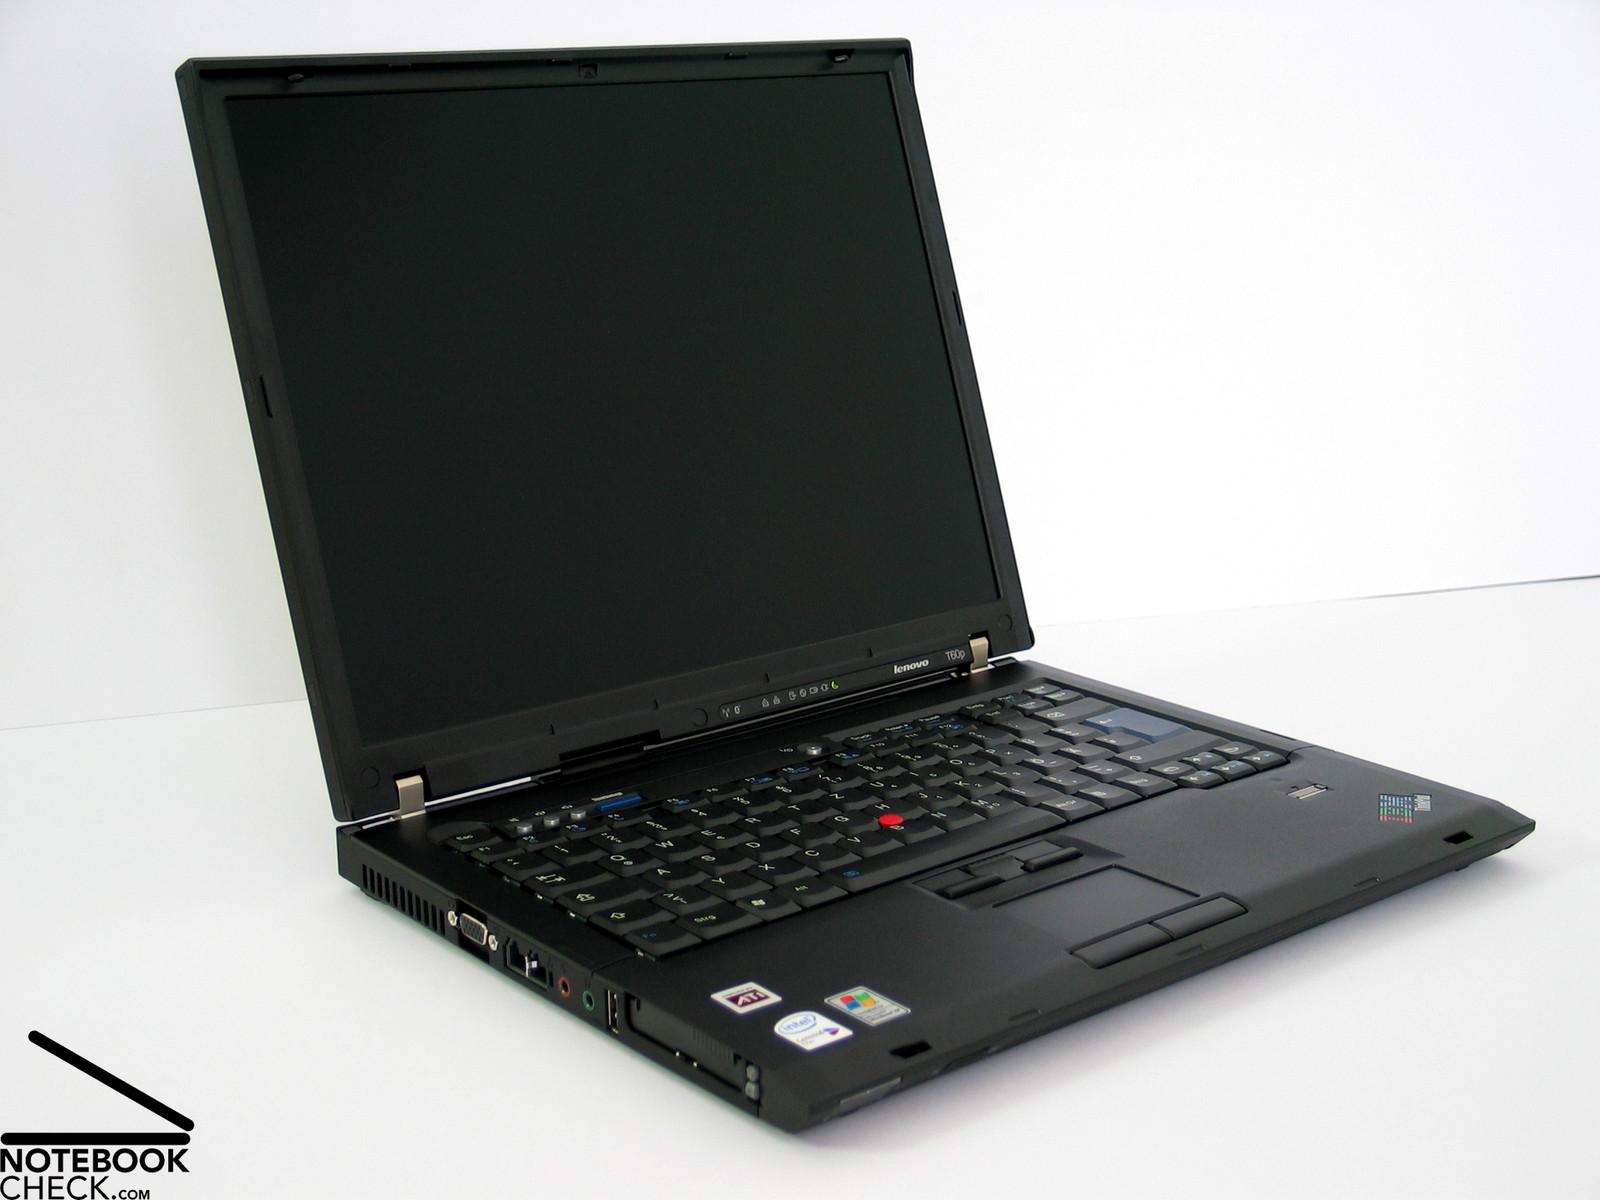 Review Lenovo / IBM Thinkpad T60p UXGA Notebook - NotebookCheck.net Reviews